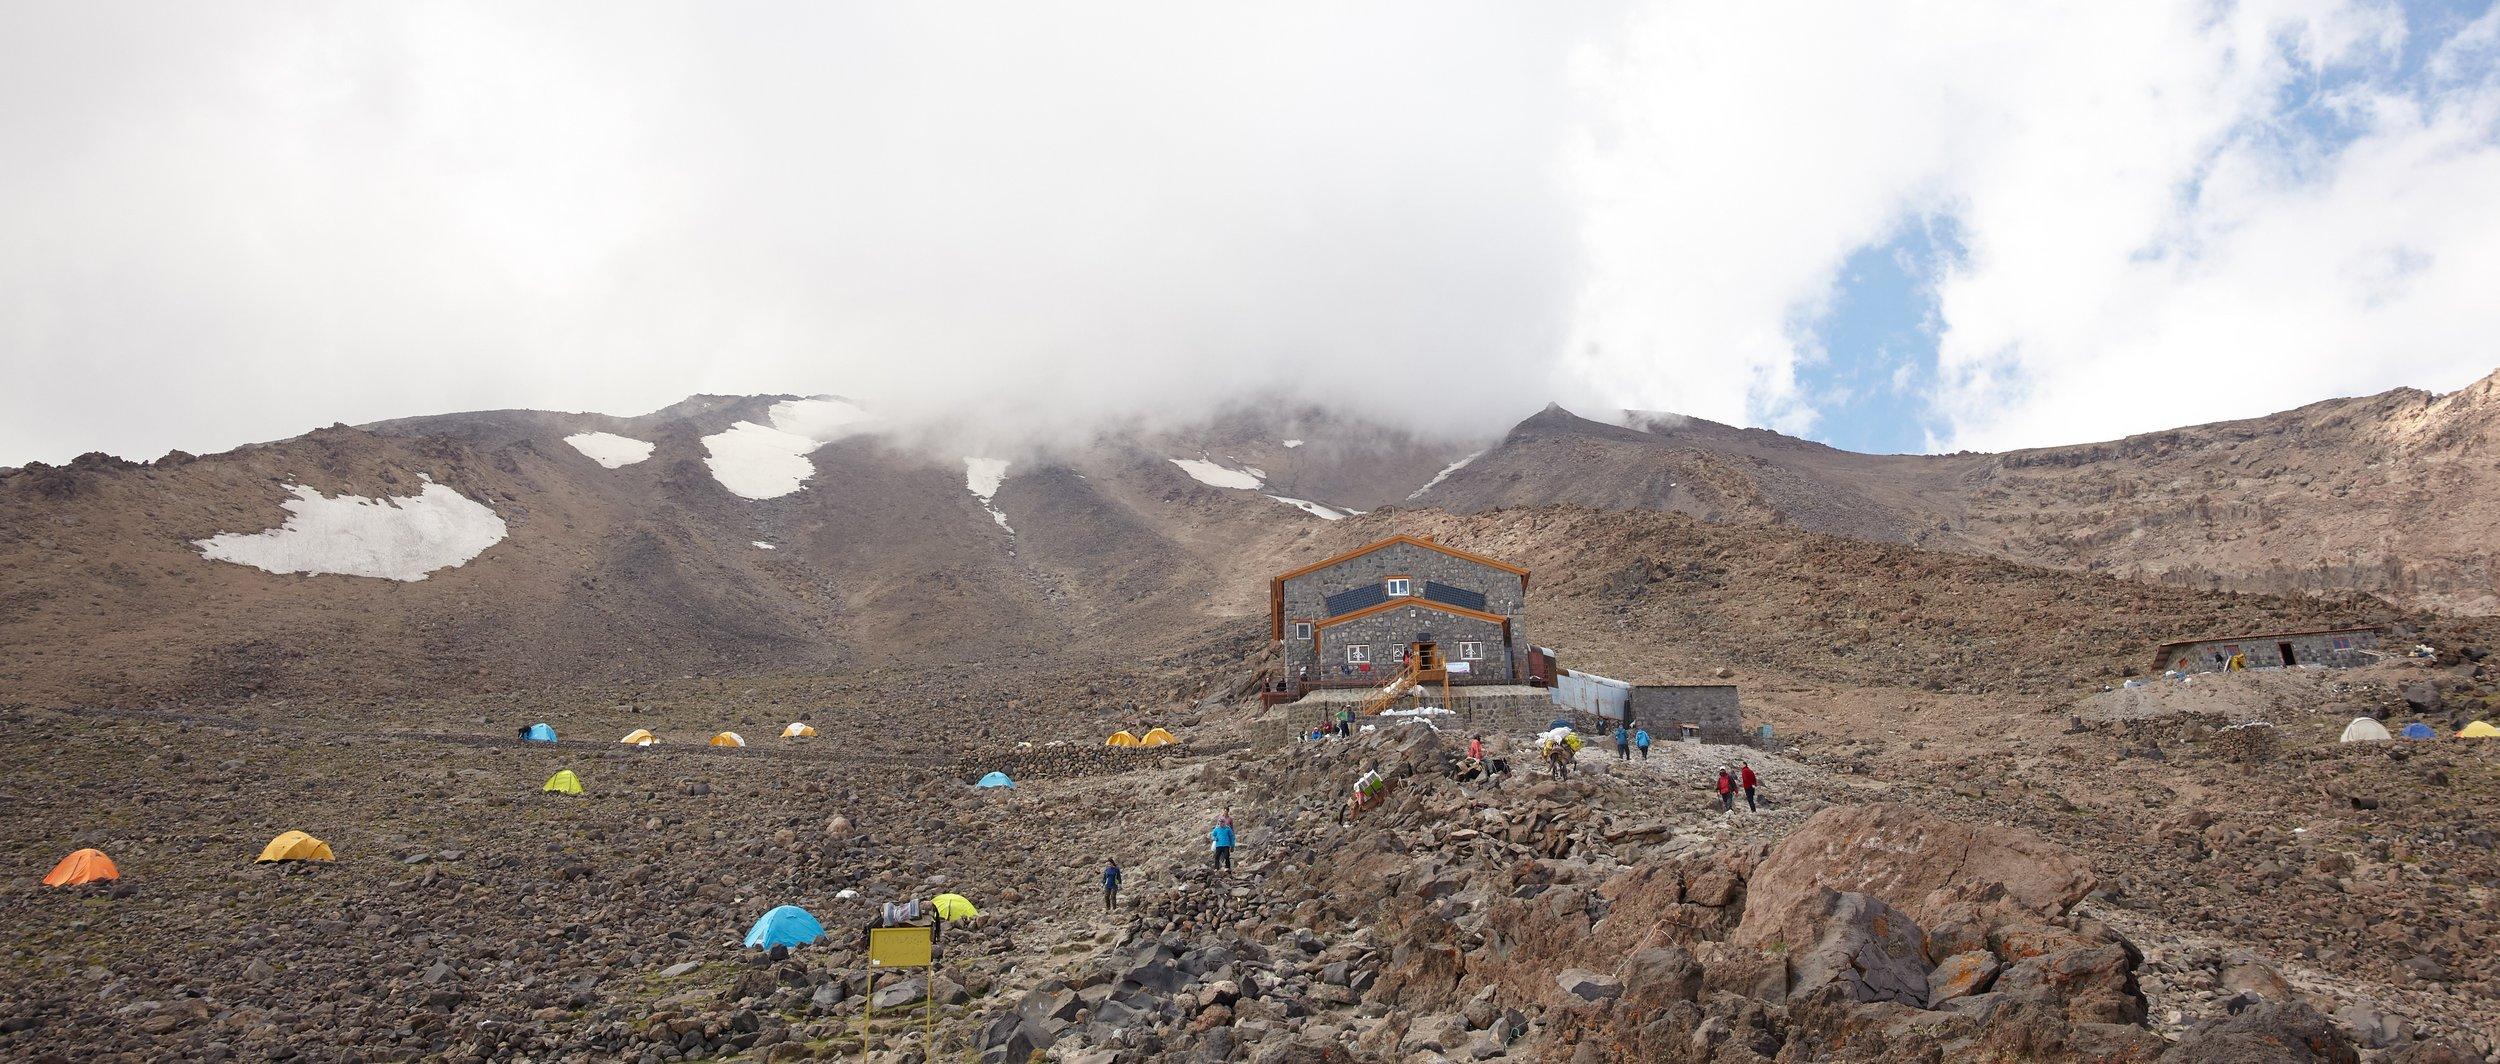 Base Camp at 4200m, Mt. Damavand, Iran